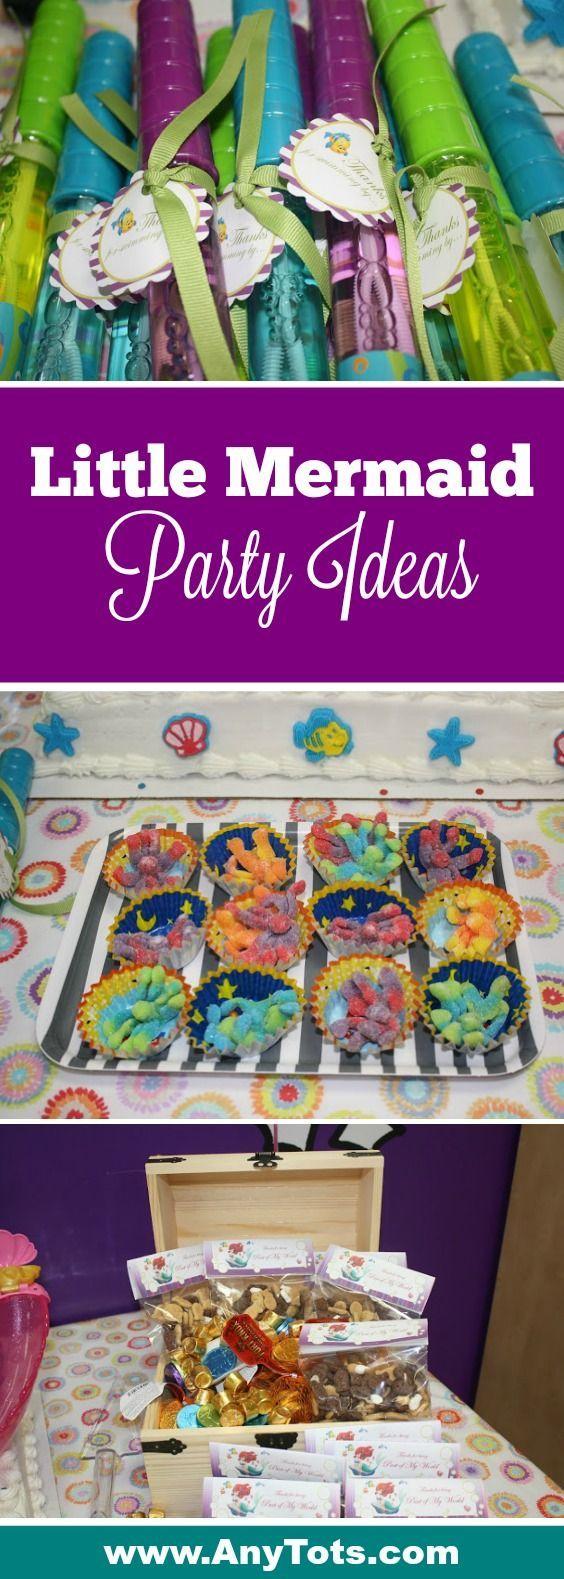 Little Mermaid Party Ideas. Ariel Birthday Cake, Little Mermaid Party Favor Idea, Under the Sea Party Treats. Little Mermaid Free Printable Tags, Octopus Gummies. More Under the Sea Party Ideas via www.anytots.com #LittleMermaid #UndertheSea #BirthdayParty #PartyIdeas #ArielParty